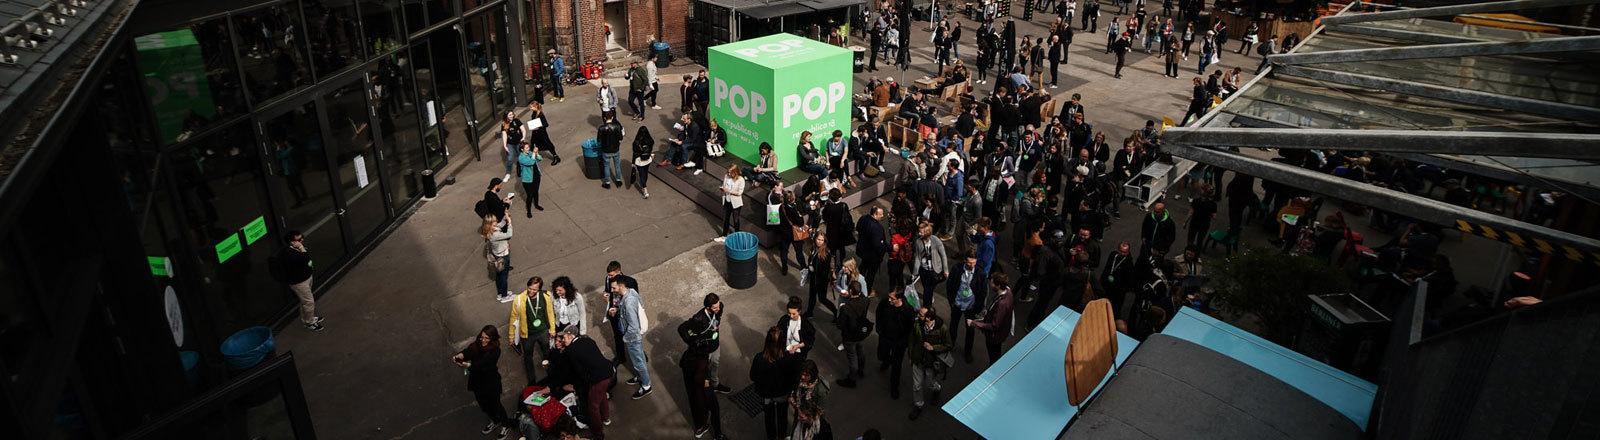 Impression re:publica 2018